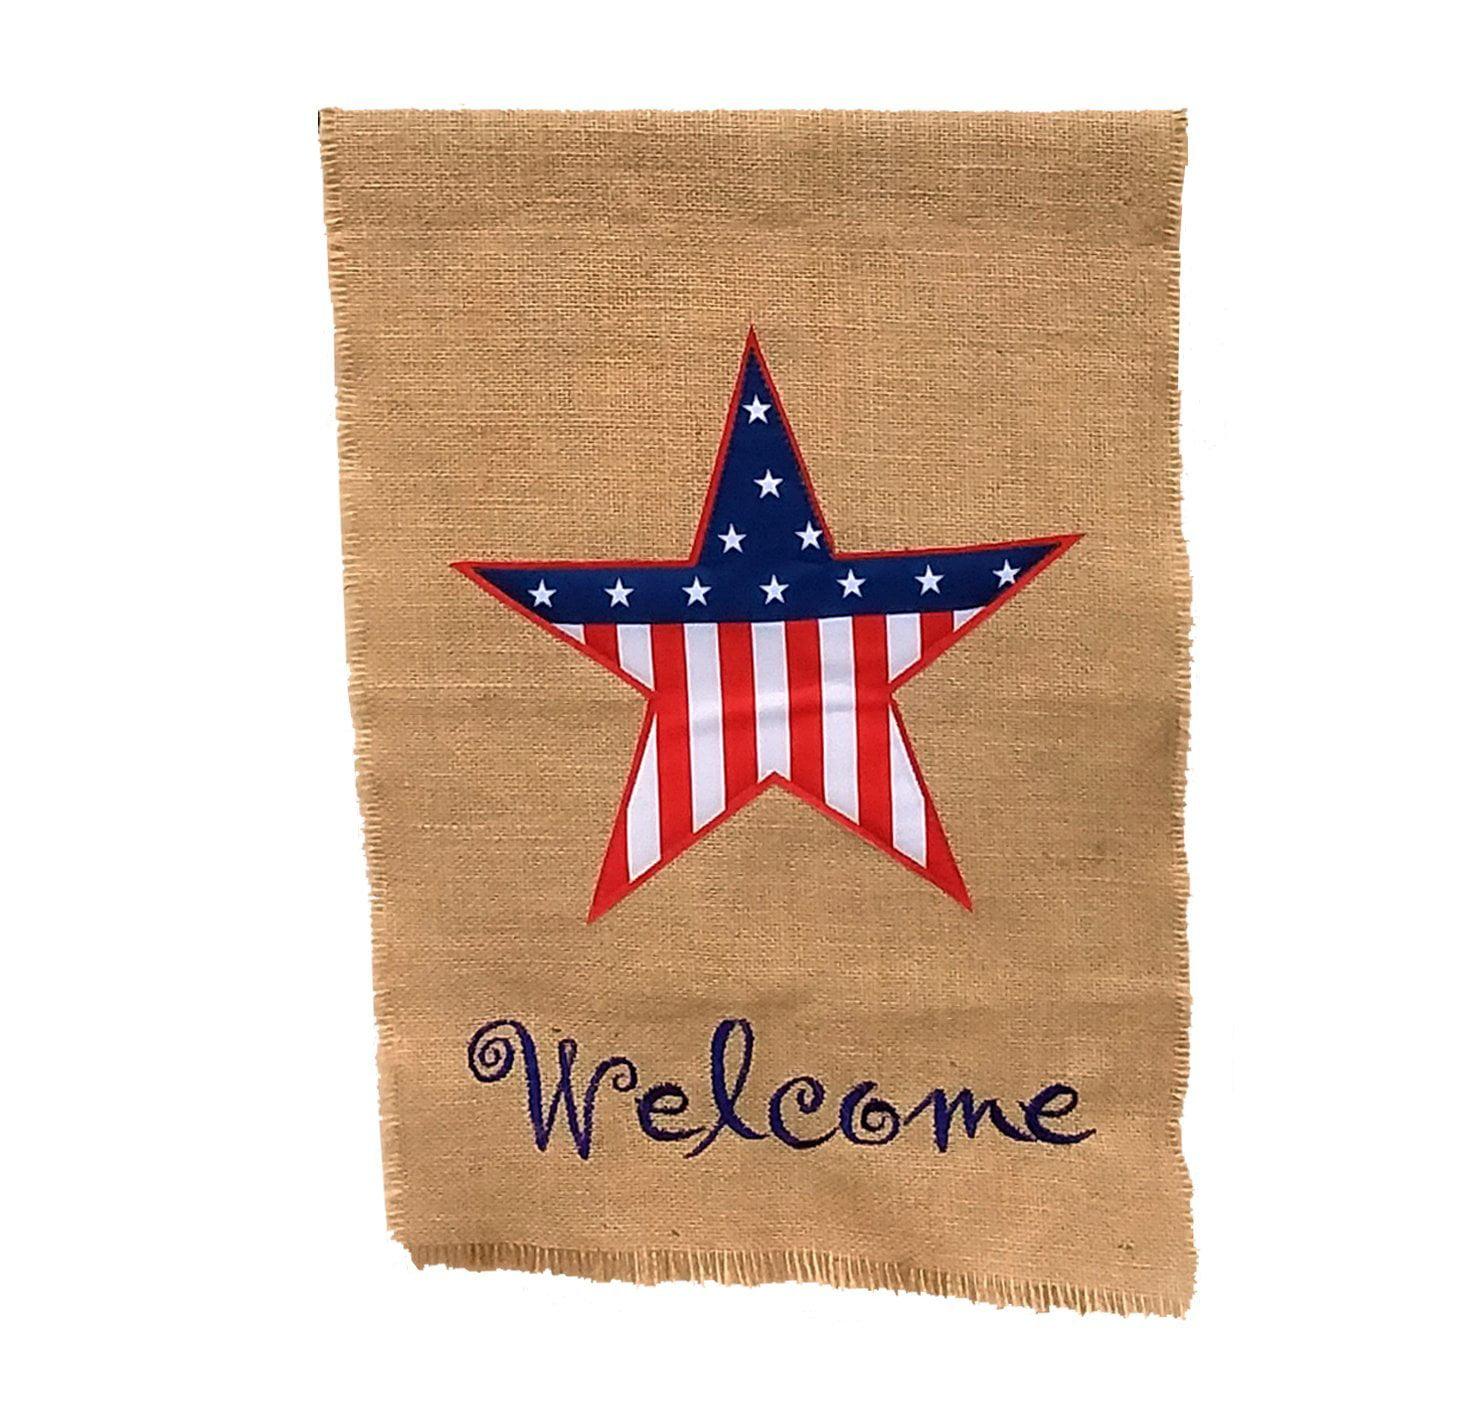 "GiftWrap Etc. Small Patriotic Burlap Garden Flag - 4th of July, Summer Yard Decor, Rustic Lawn Decorations, Decorative Porch Flag, Stars & Stripes, Mini 12"" x 18"